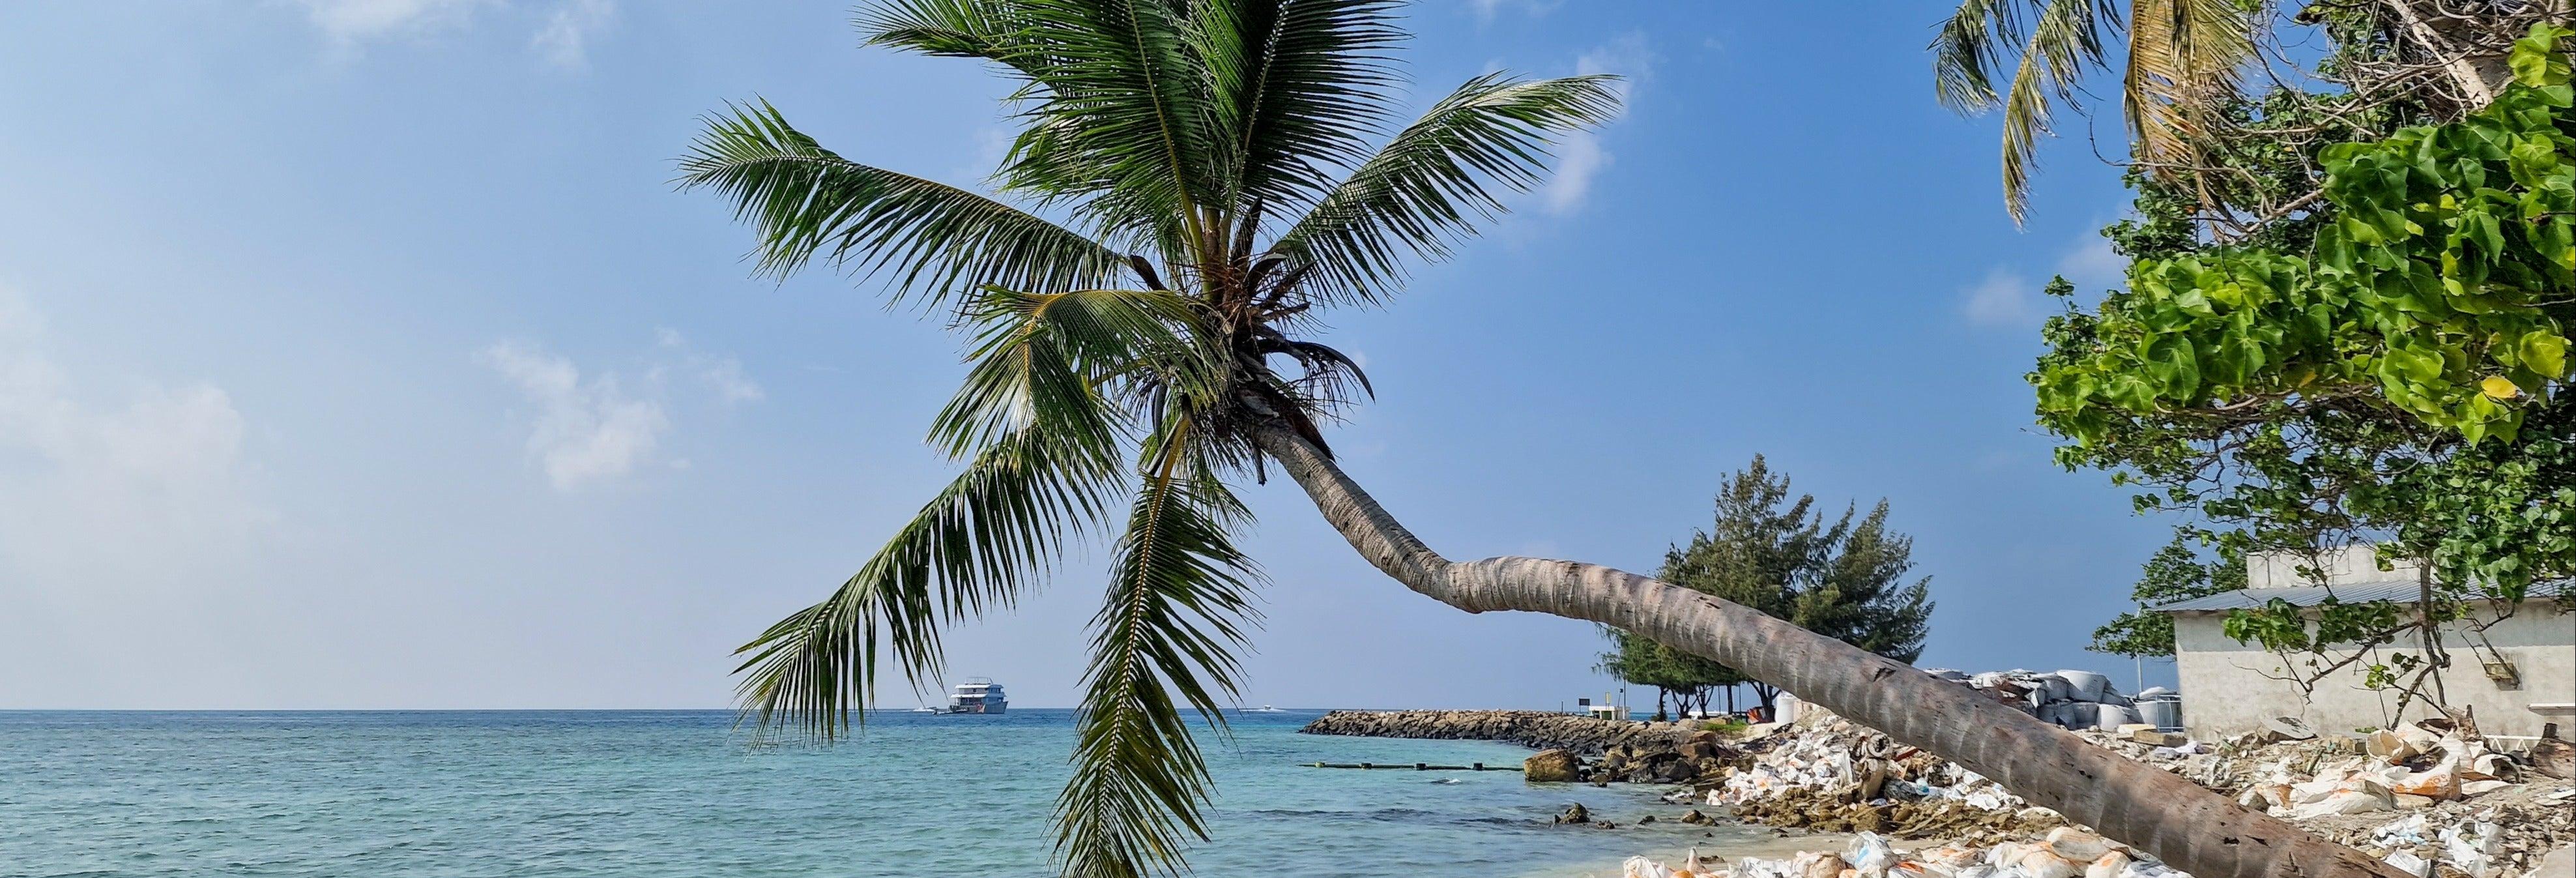 Excursão às ilhas Gulhi e Maafushi